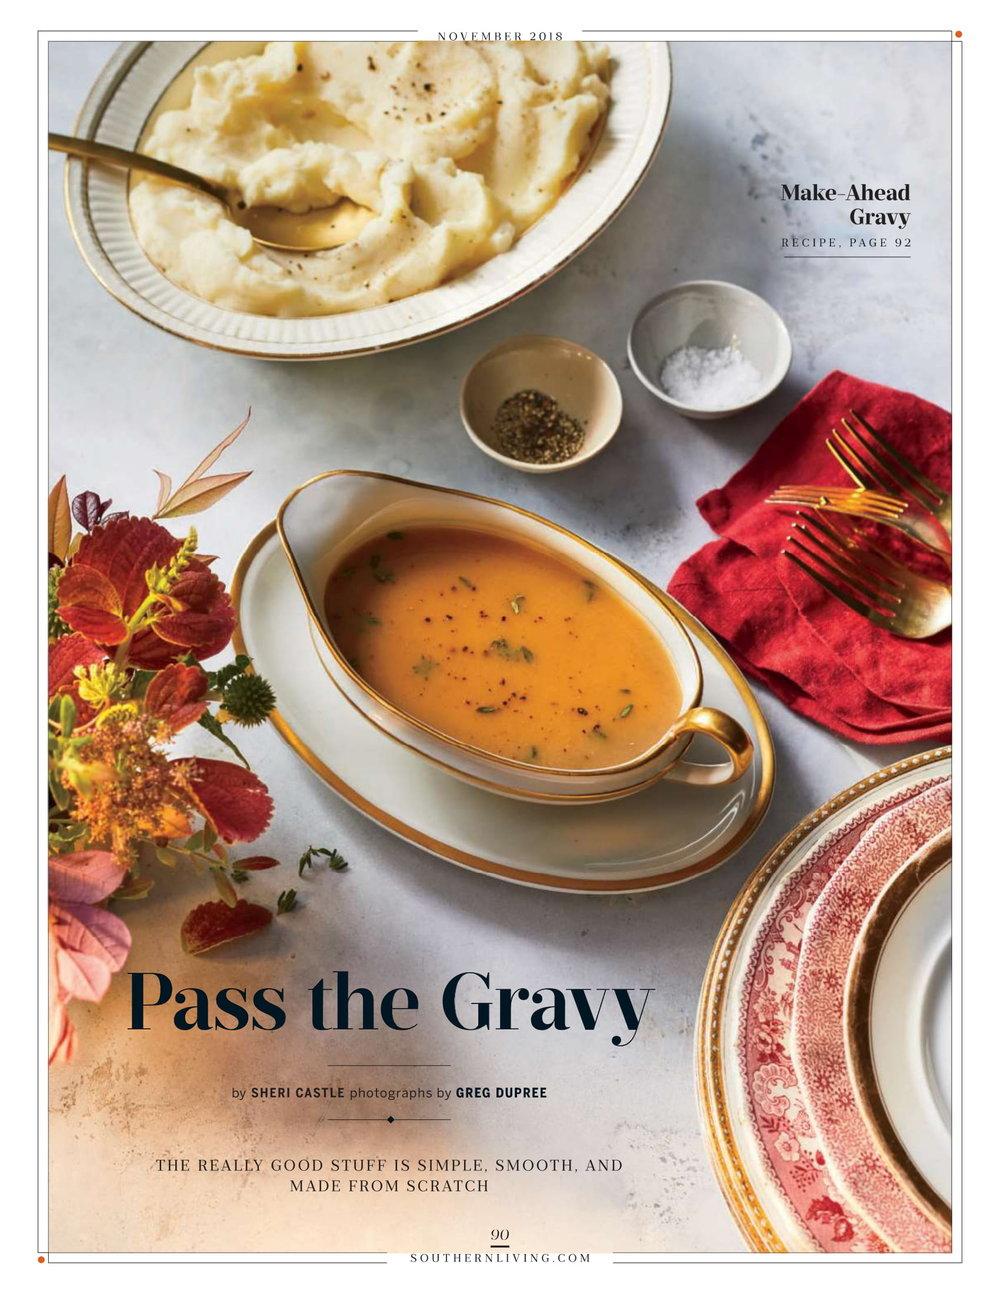 Gravy story 11.2018-1.jpg